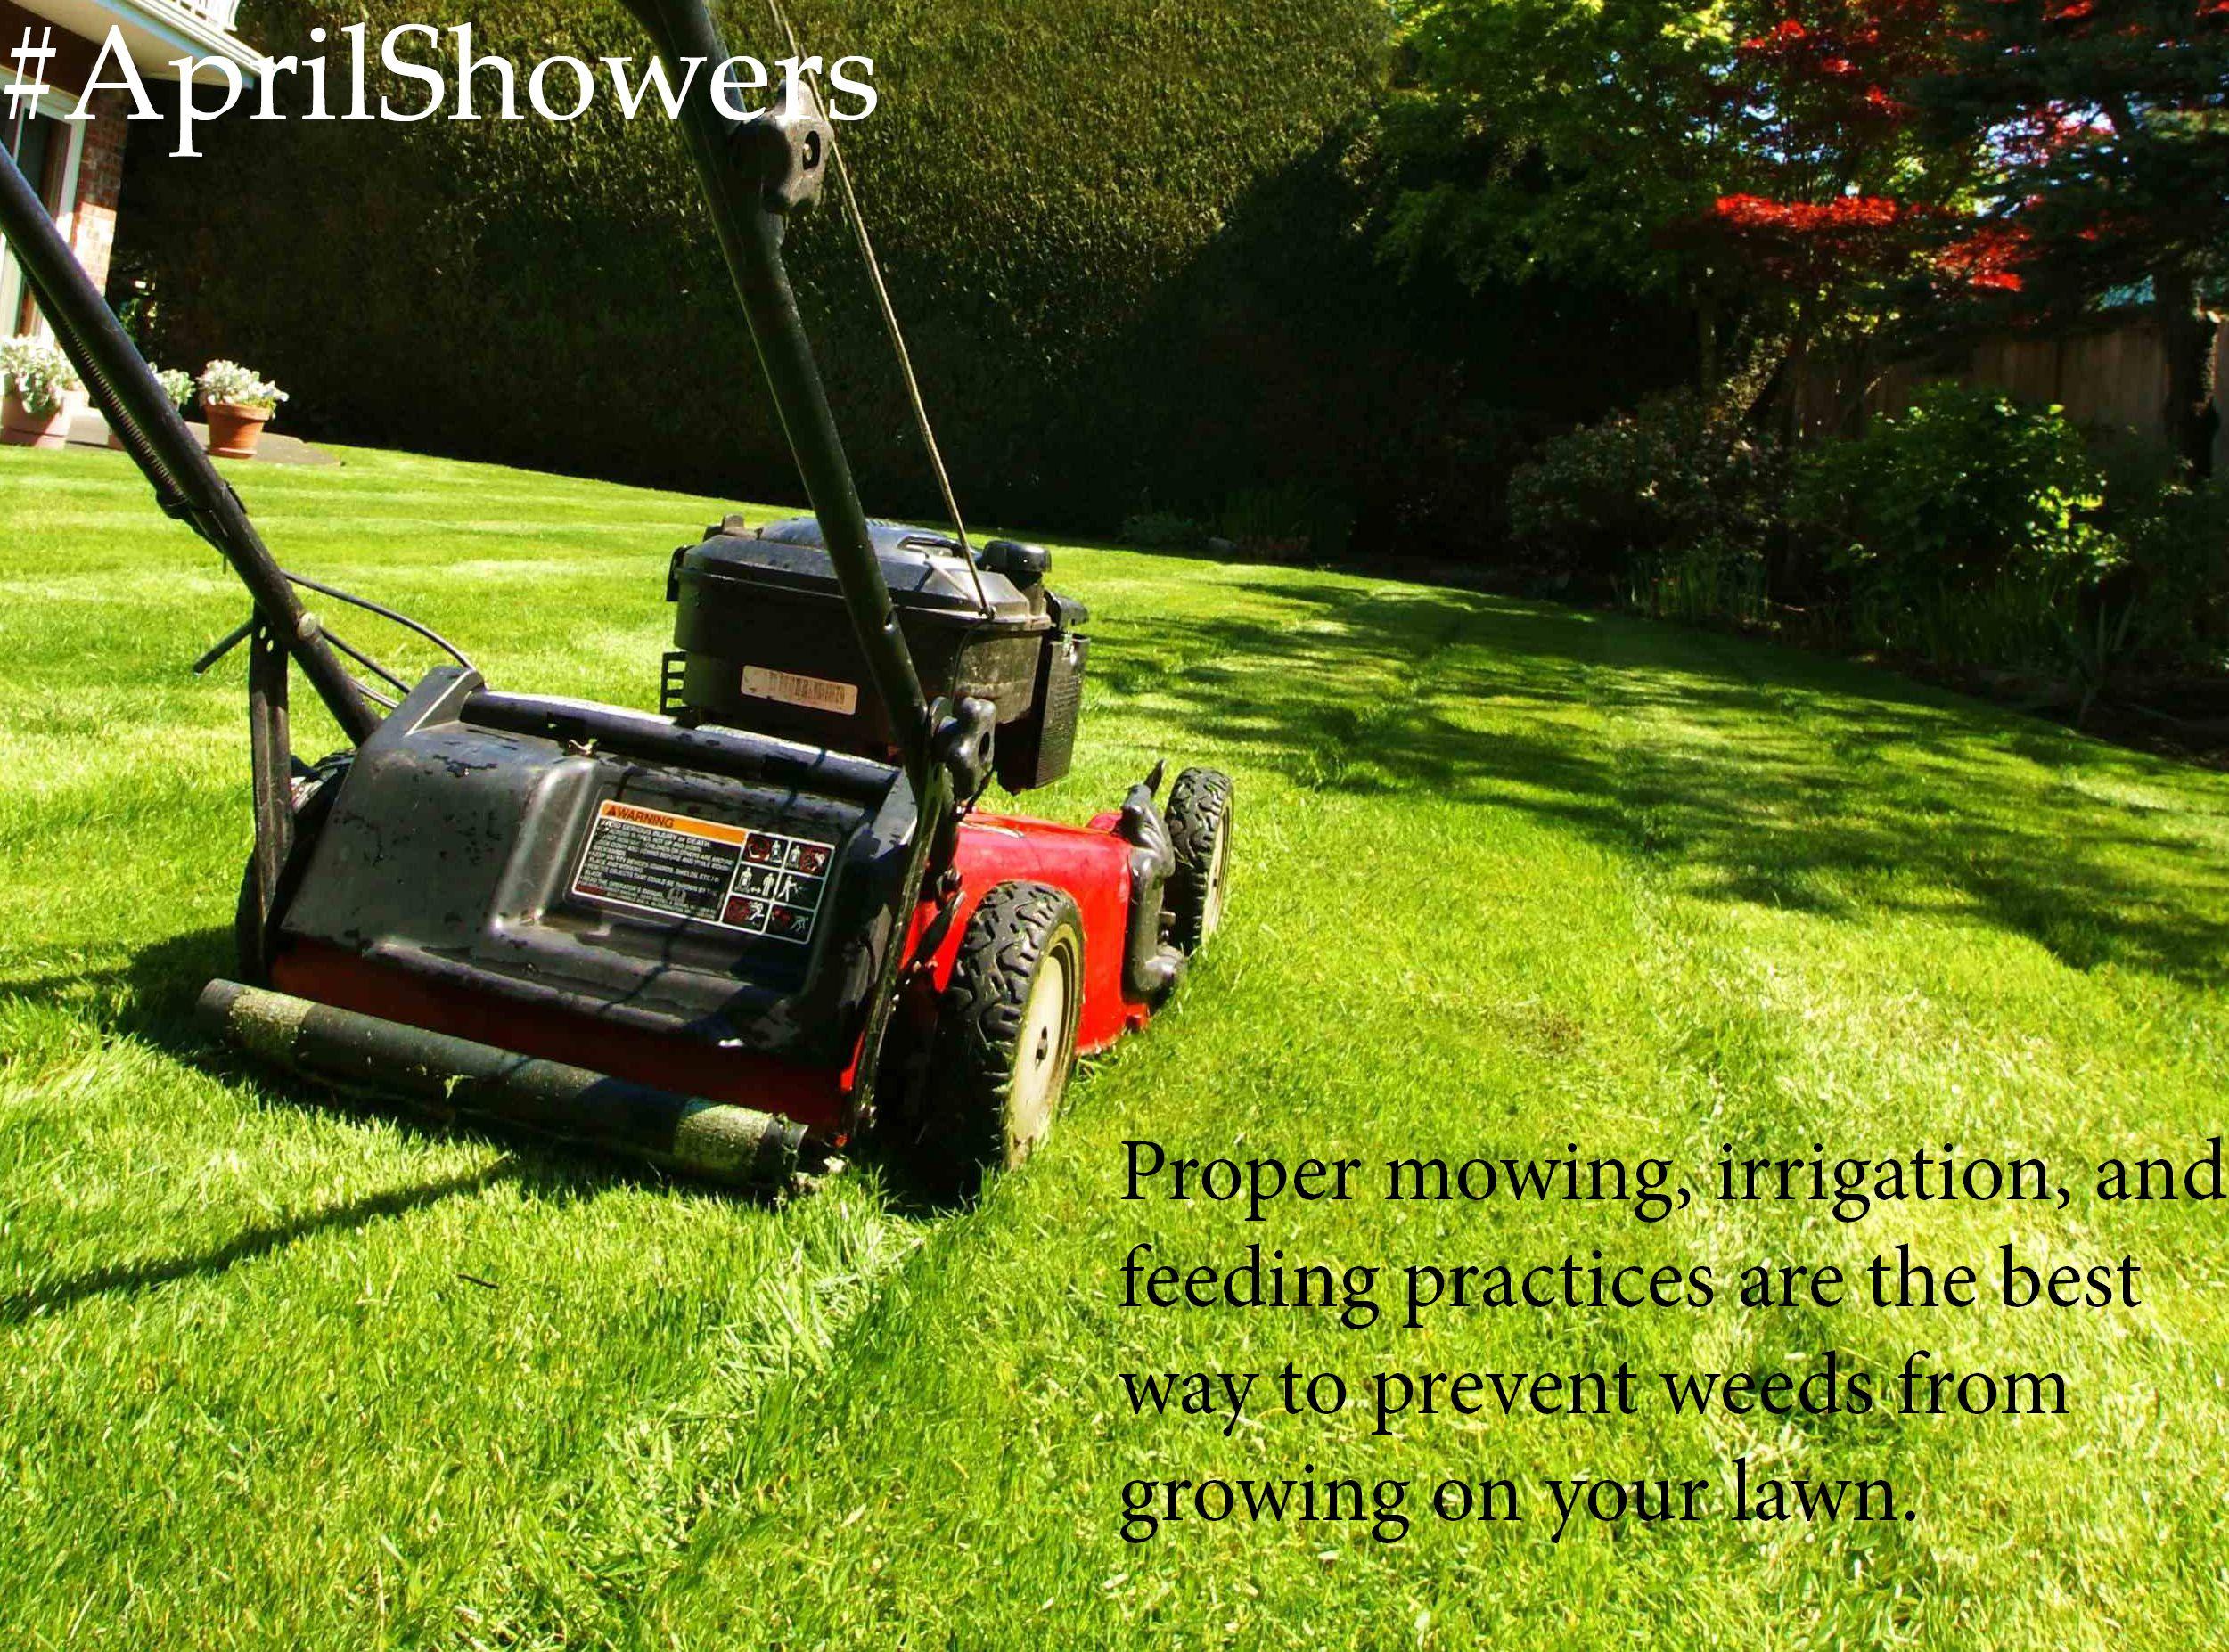 Aprilshowers tip4 mowing preventweeds green lawn